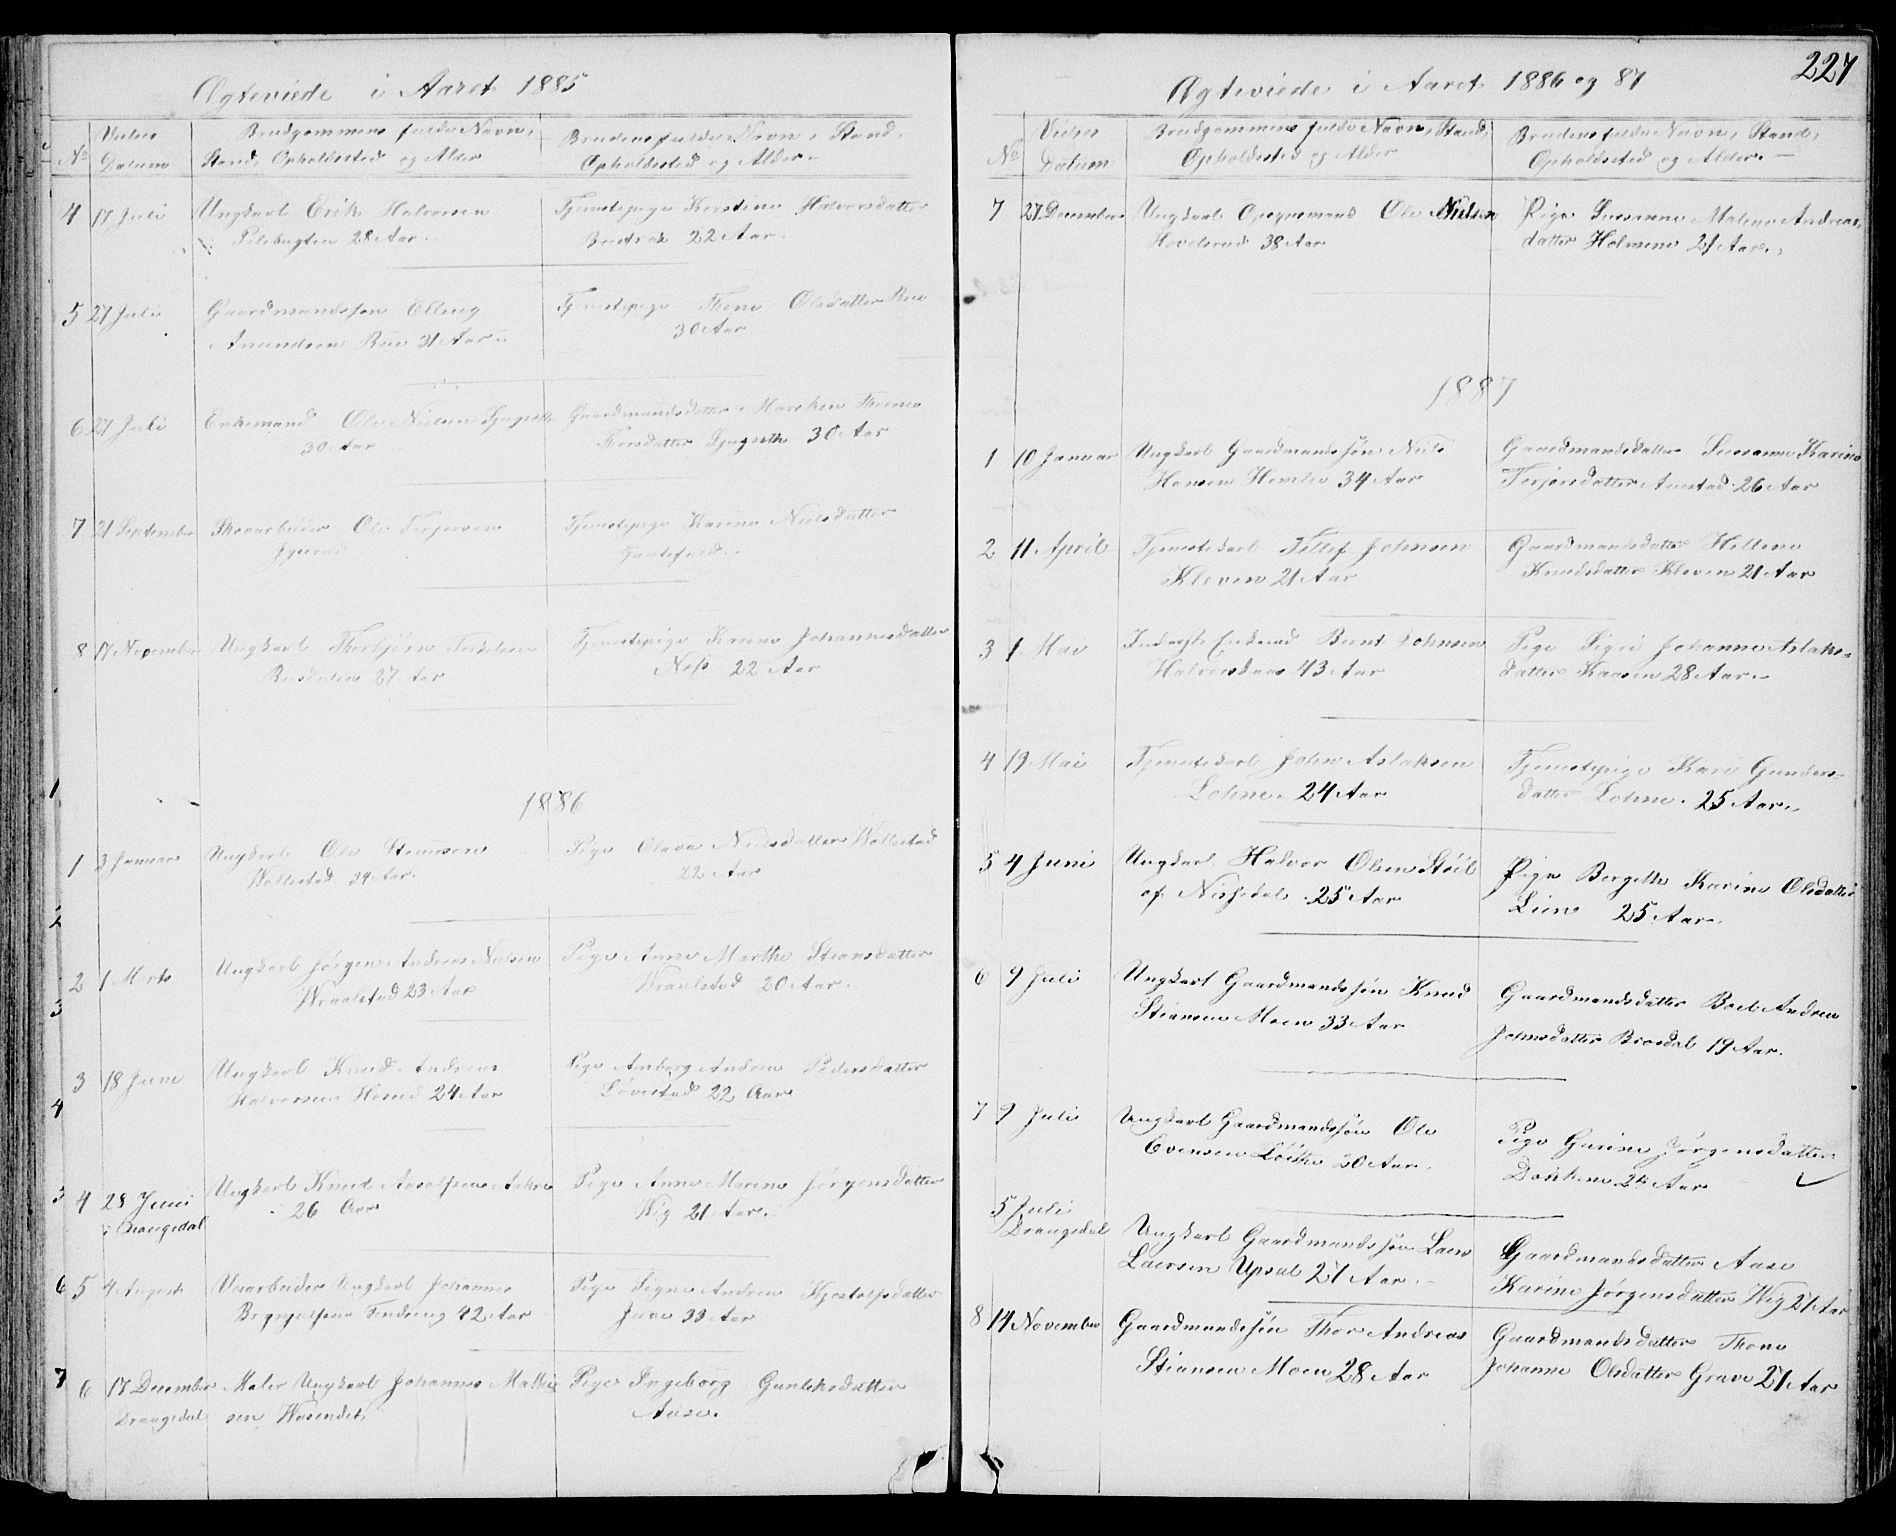 SAKO, Drangedal kirkebøker, G/Gb/L0001: Klokkerbok nr. II 1, 1856-1894, s. 227